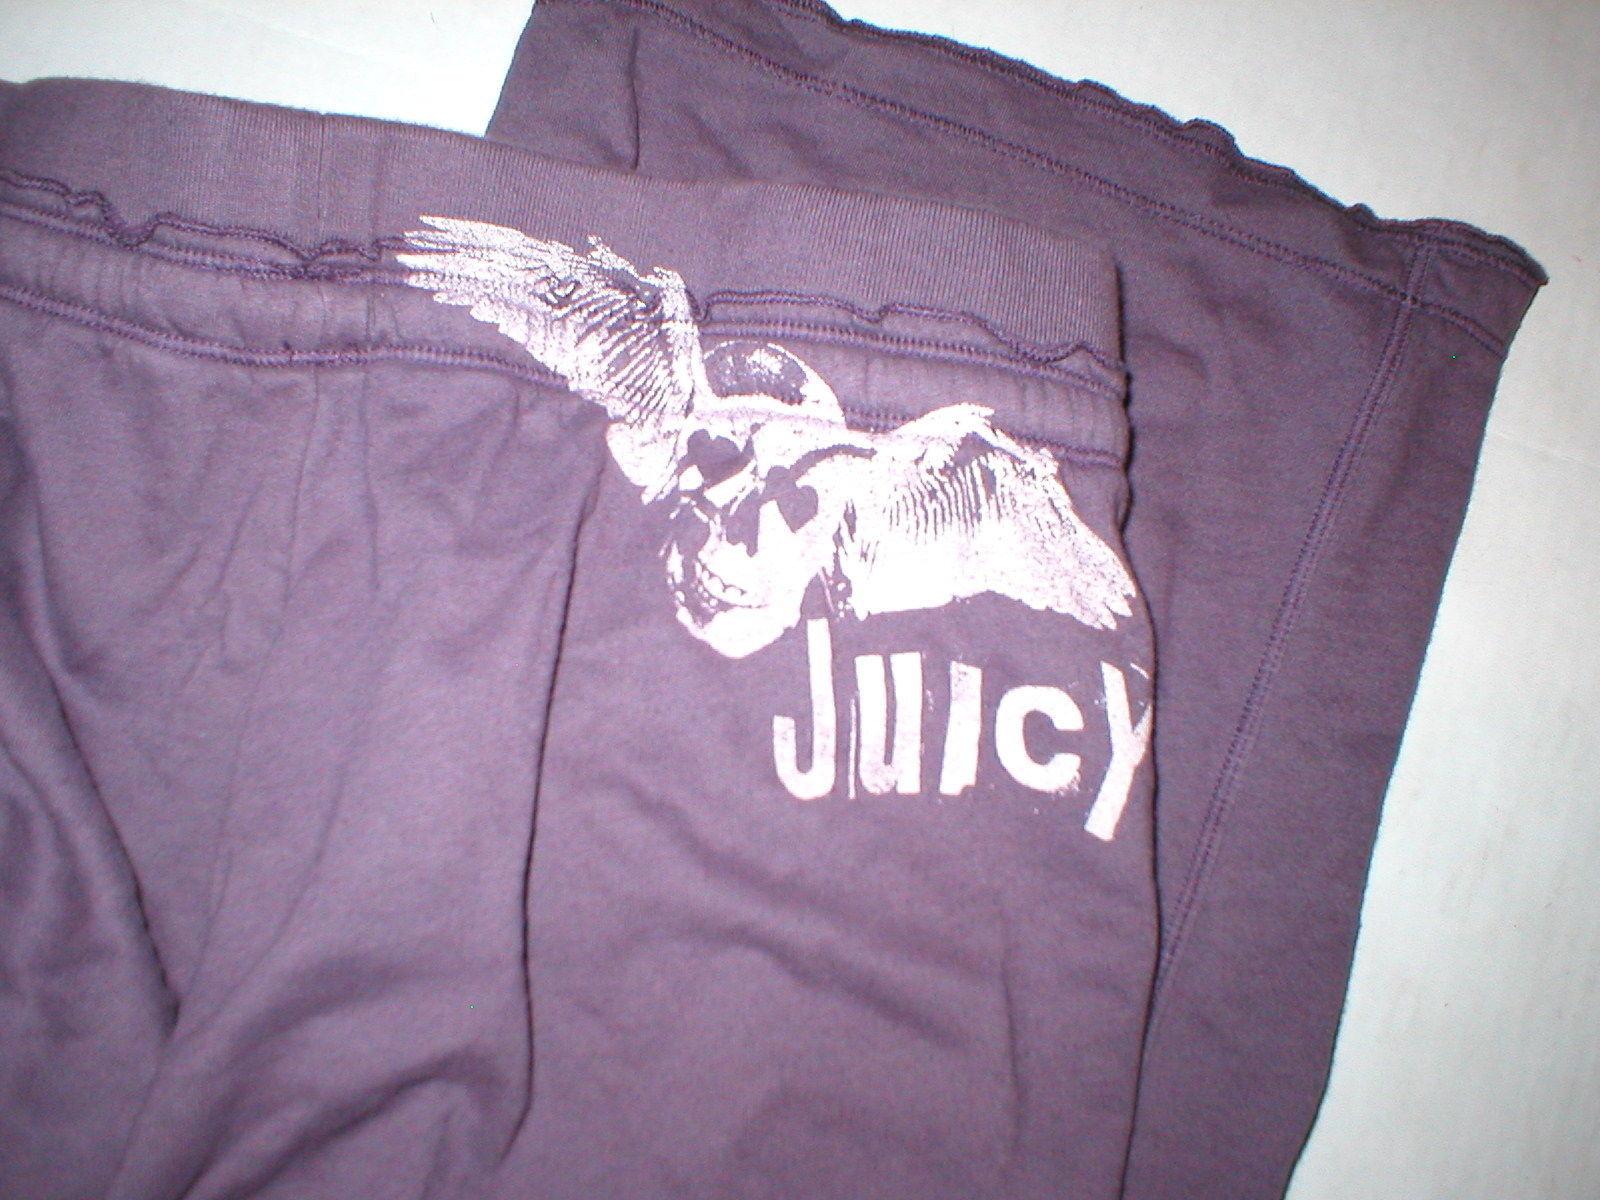 EUC Womens Large Juicy Couture Pants Purple L Pockets Skull Wings Logo 32 inseam